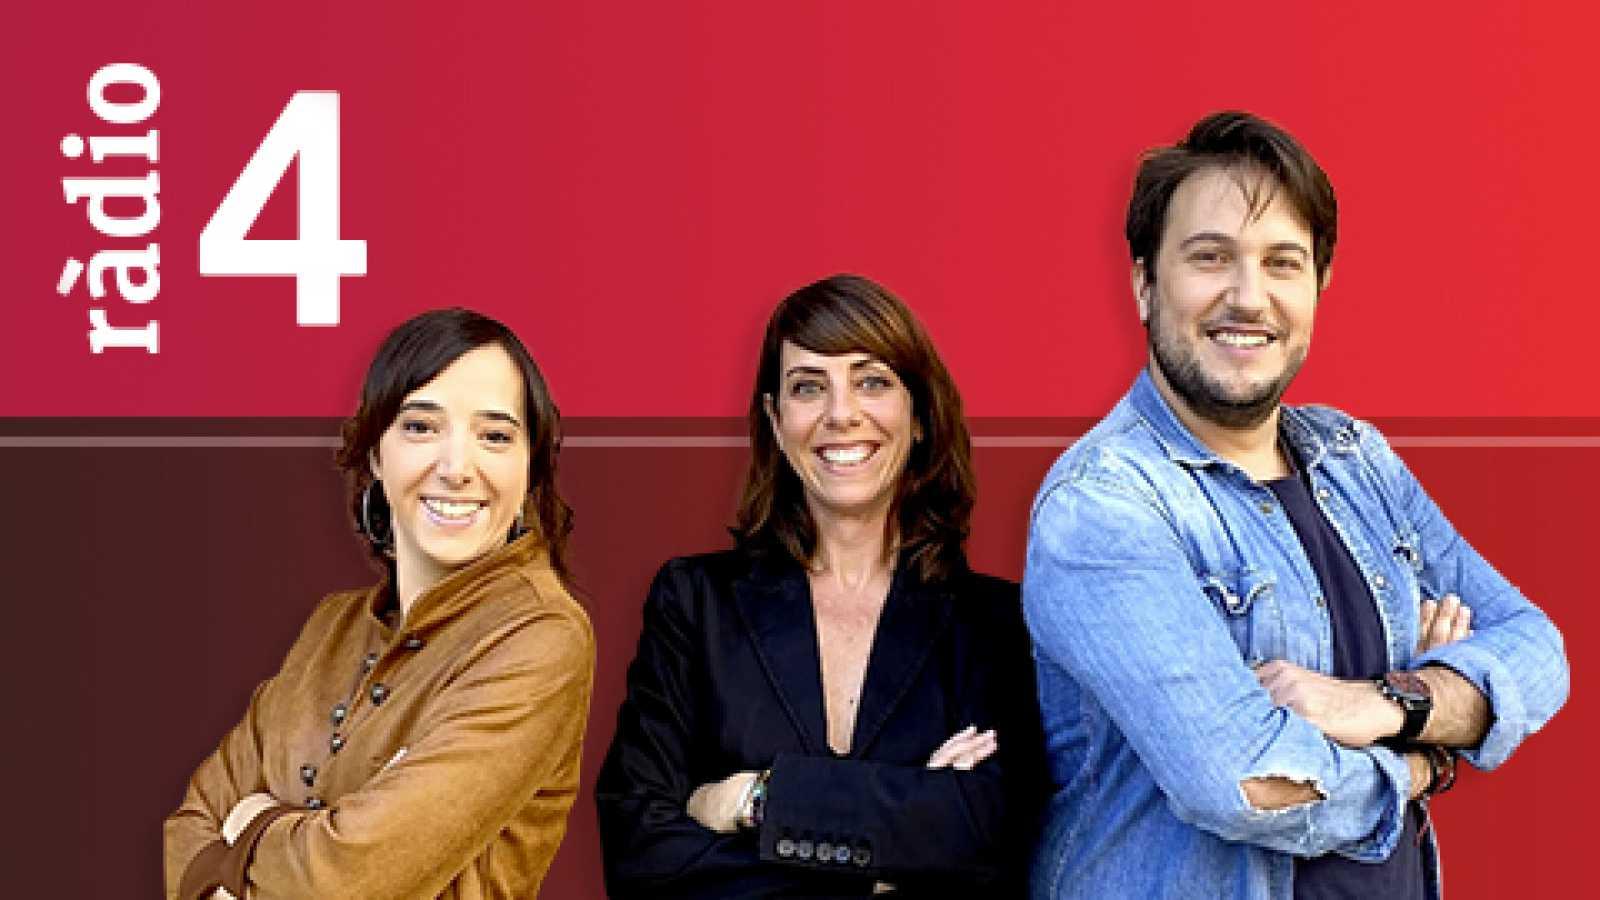 En Directe a Ràdio 4 - Segona hora - 25/01/21